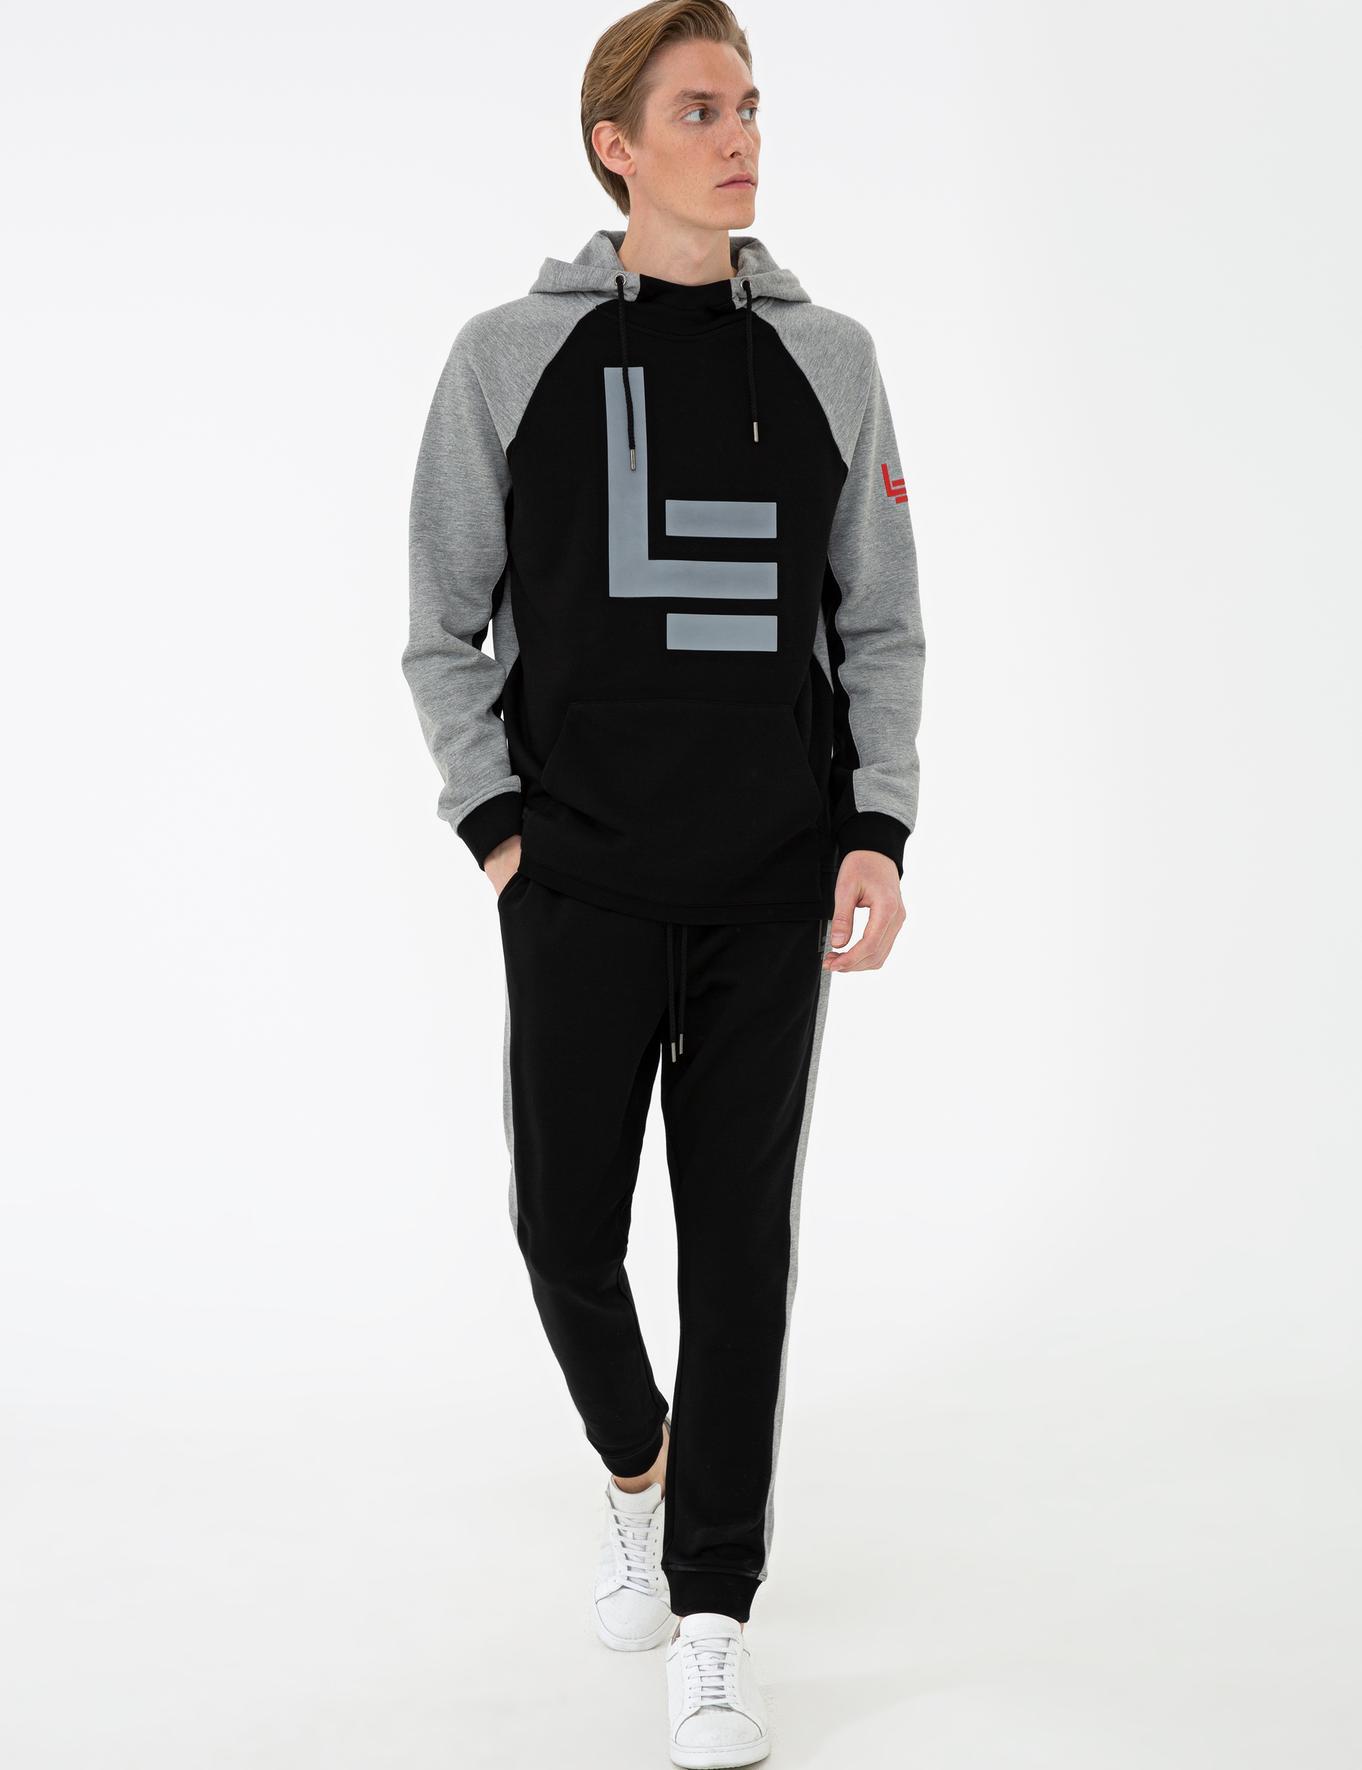 Siyah Slim Fit Sweatshirt - 50236145014